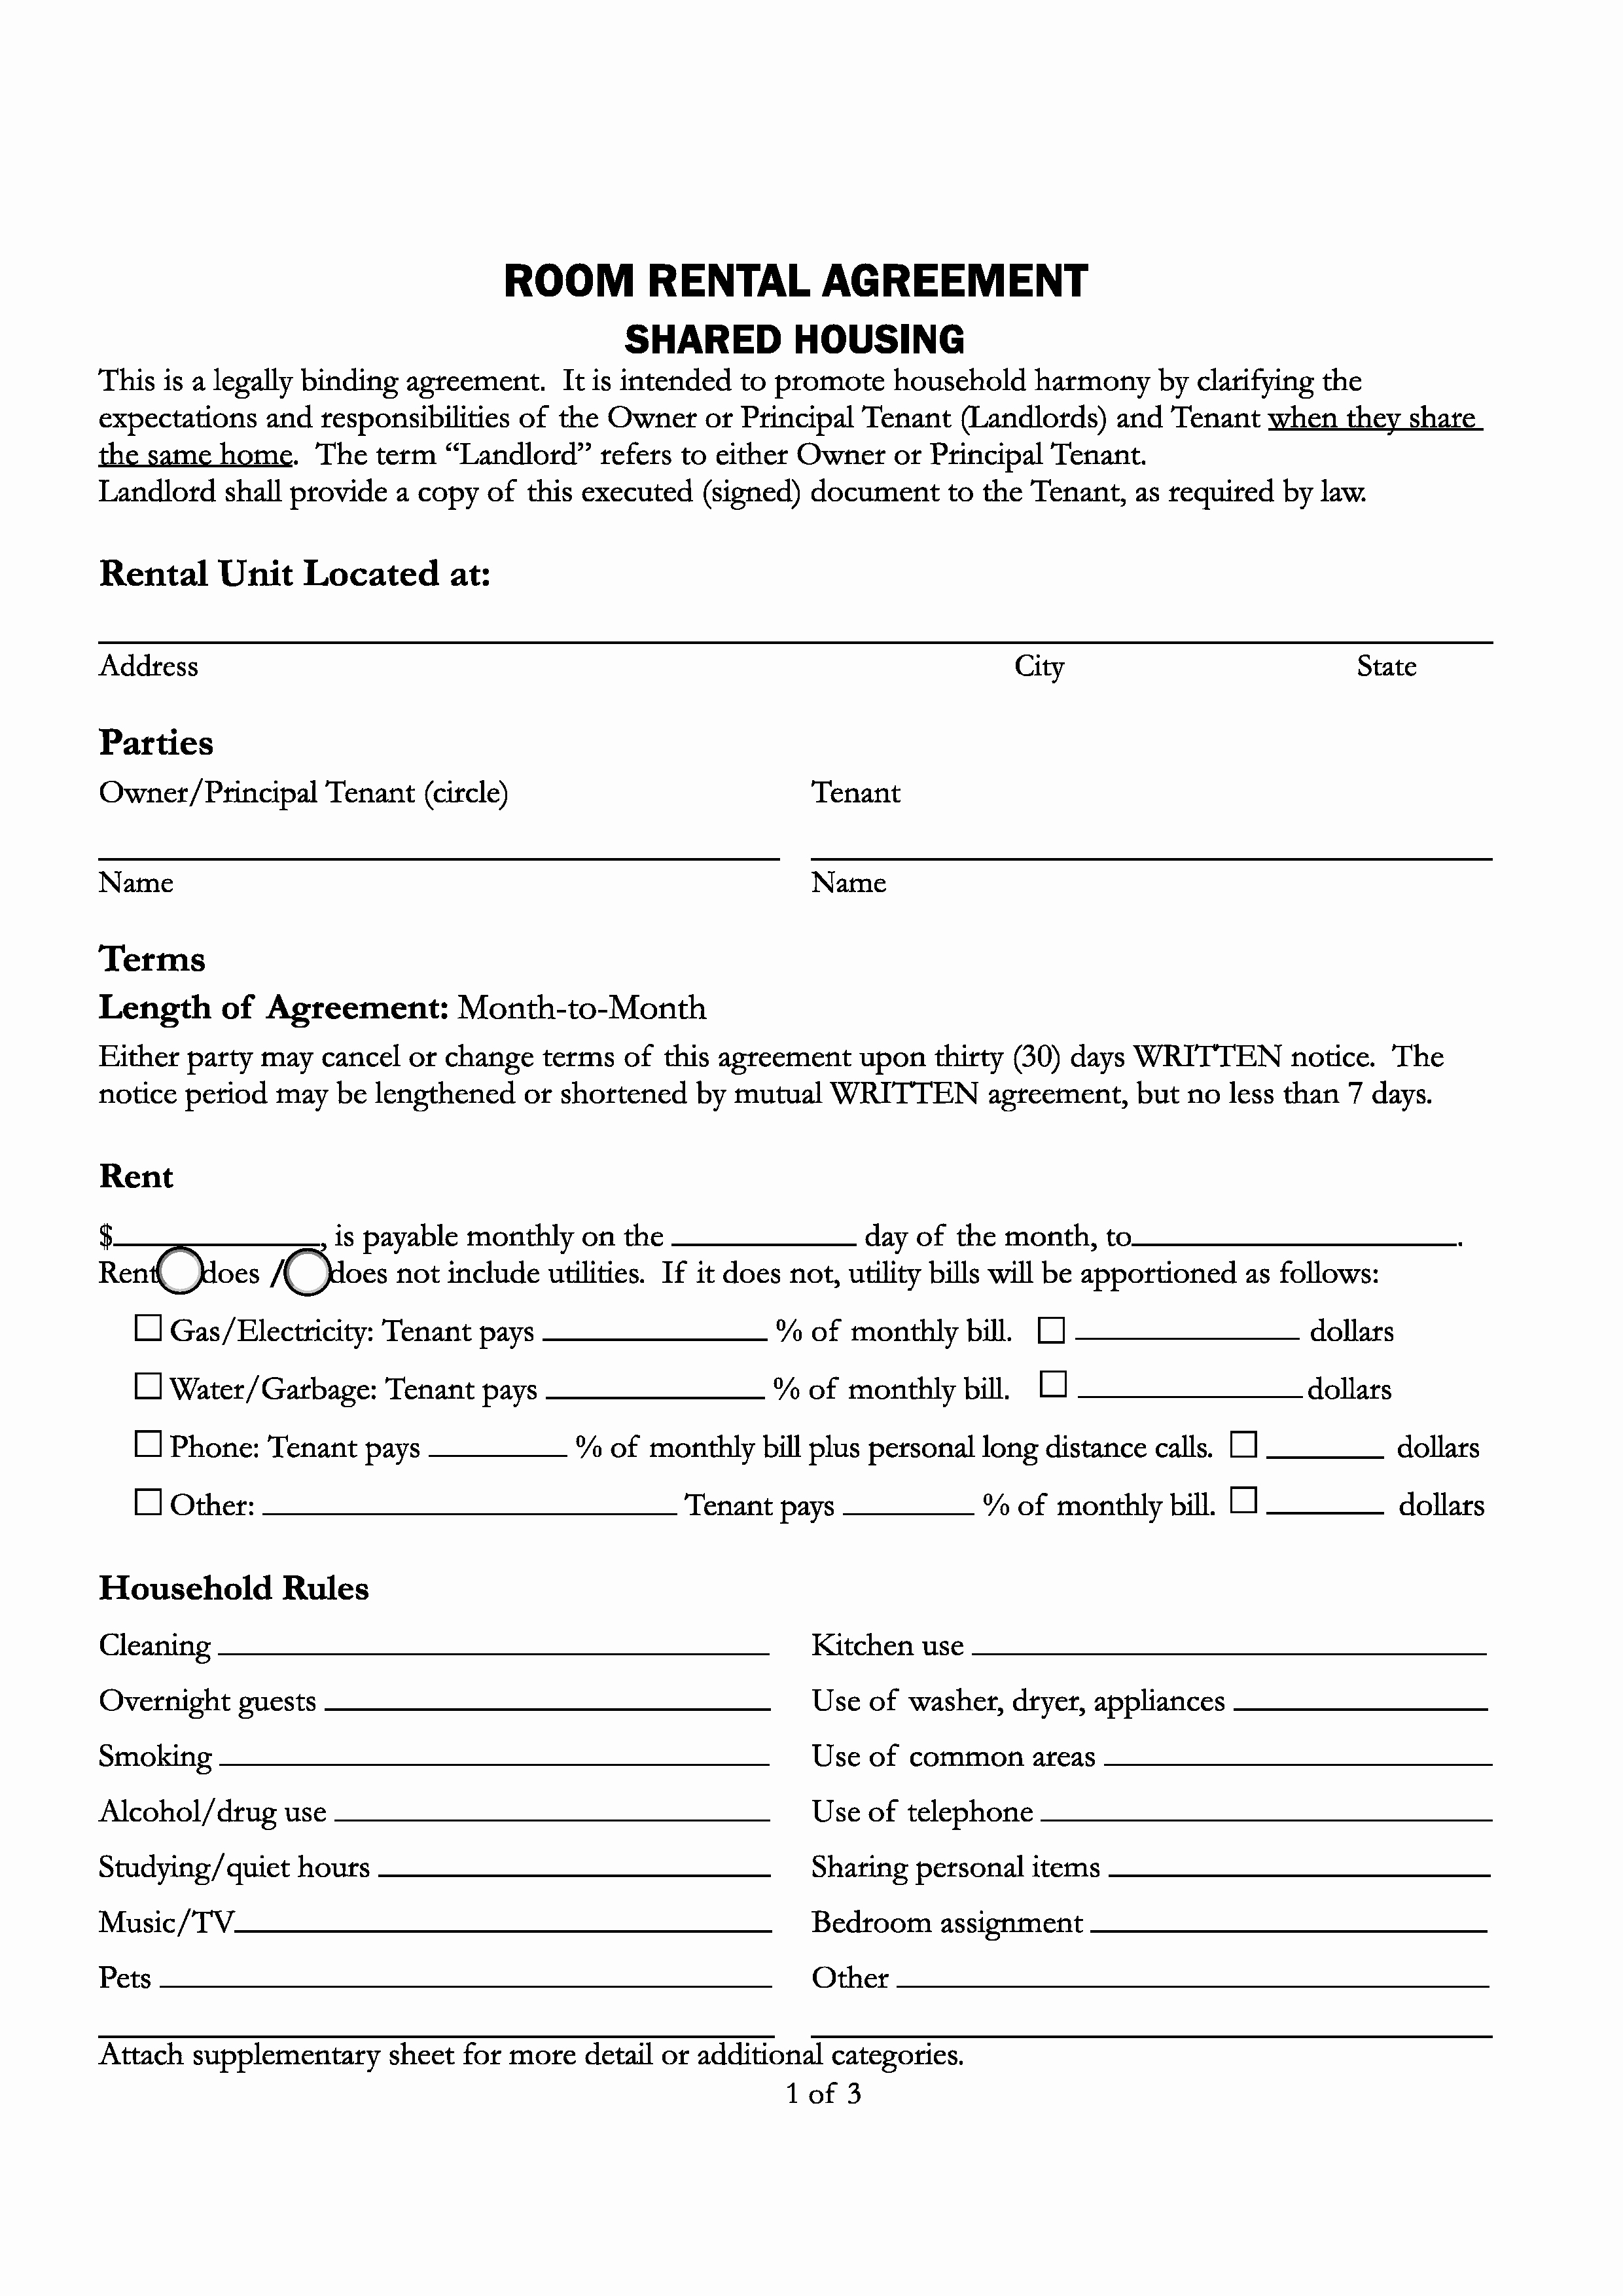 Free Rental Agreement Pdf Lovely Free Santa Cruz County California Room Rental Agreement